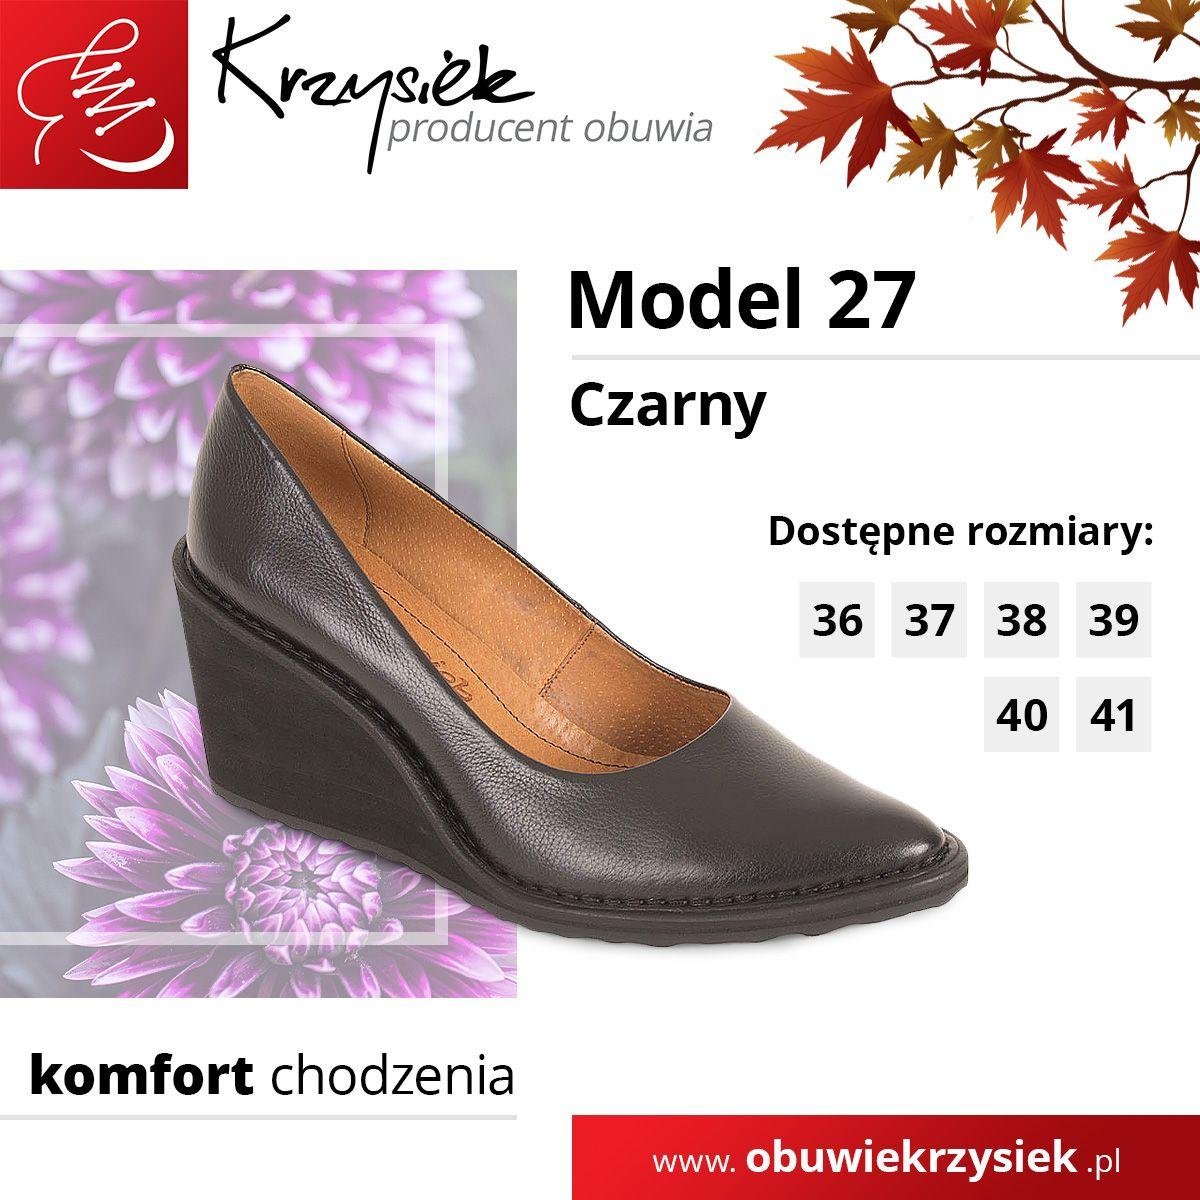 Polbuty Damskie Model 27 Czarne Loafers Shoes Fashion